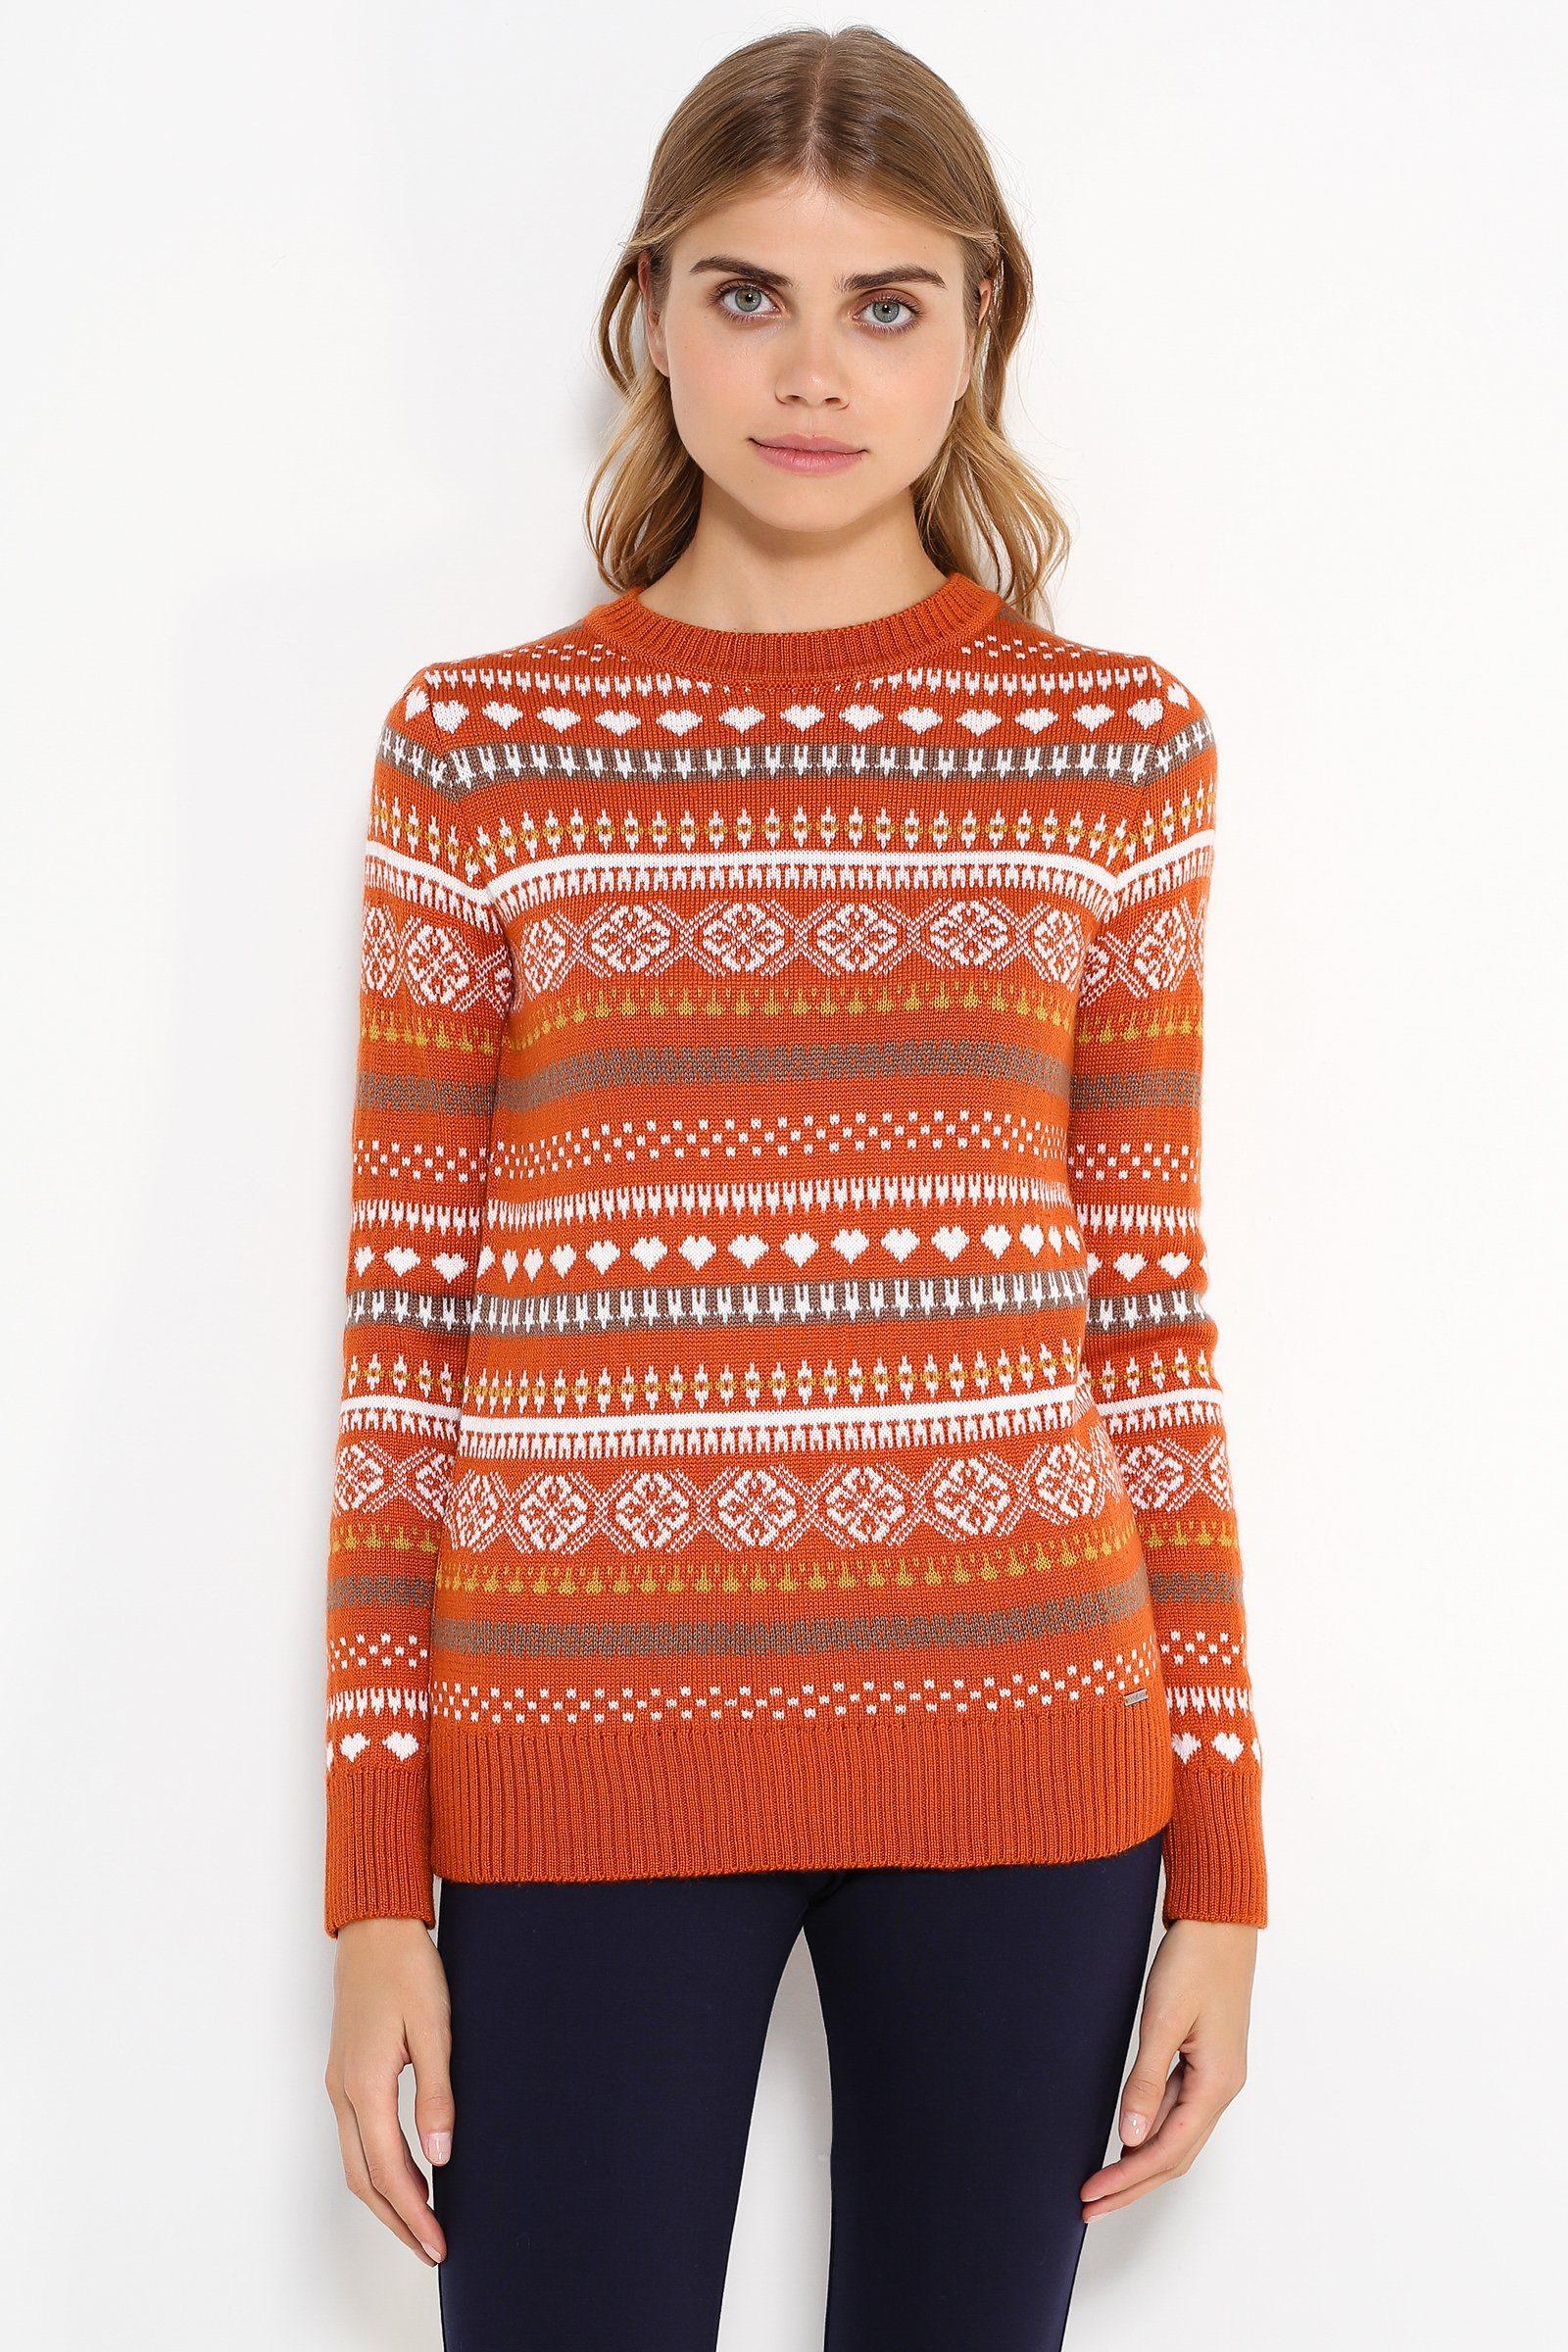 Finn Flare Pullover mit auffälligem Muster